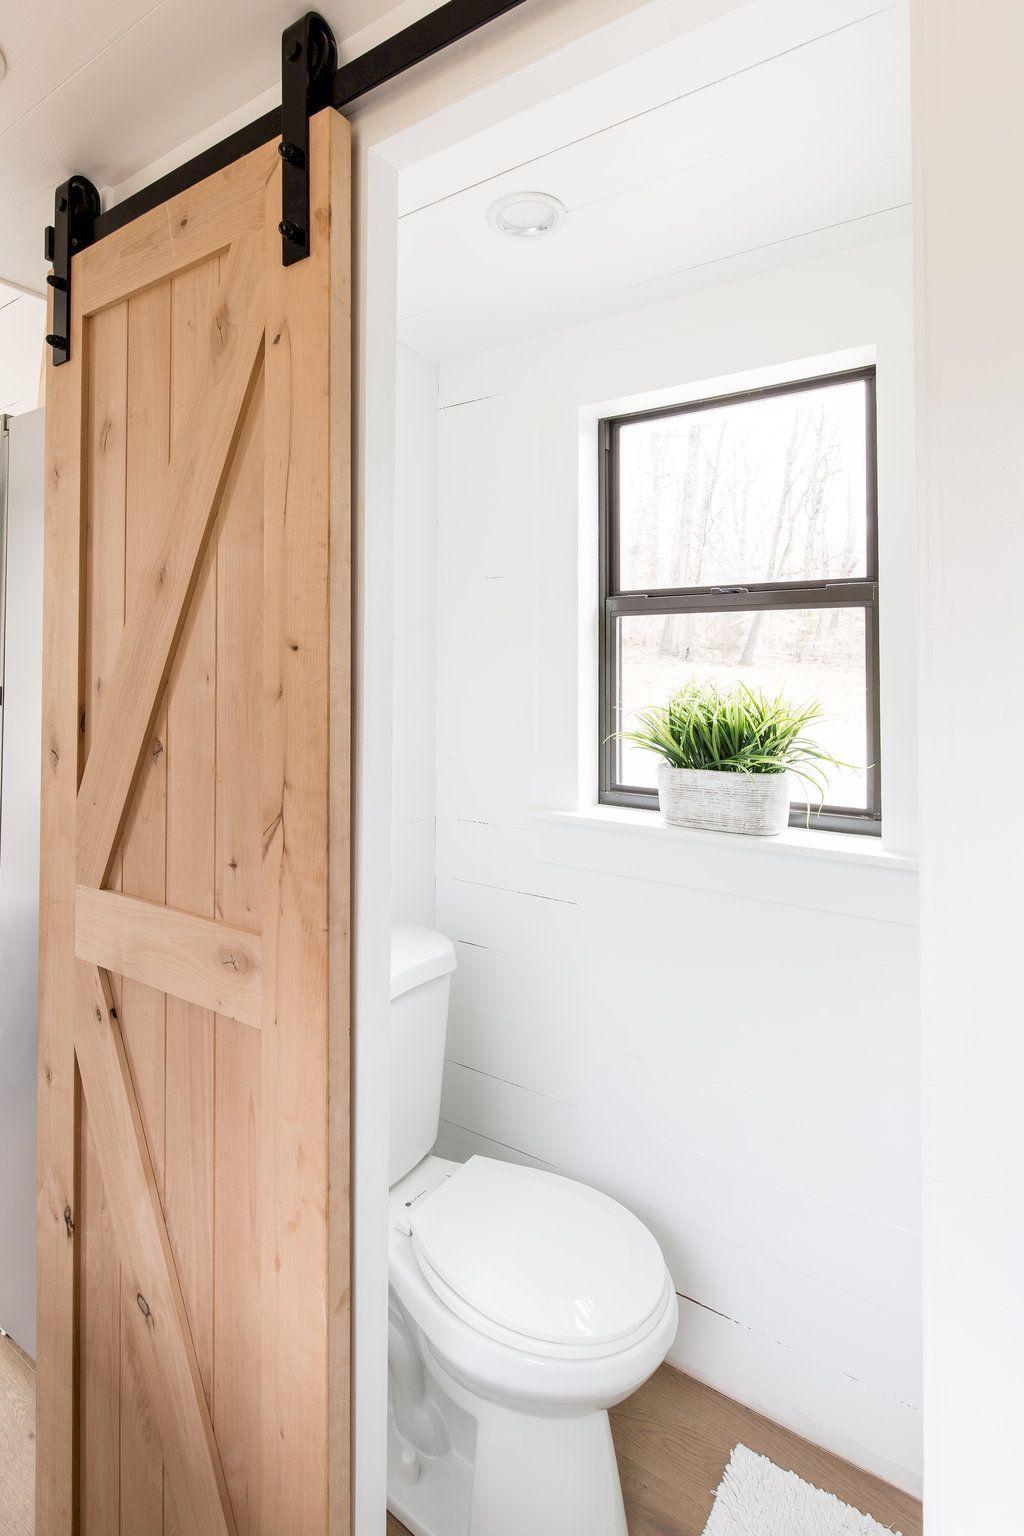 47 genius tiny house bathroom shower design ideas #tinyhousebathroom